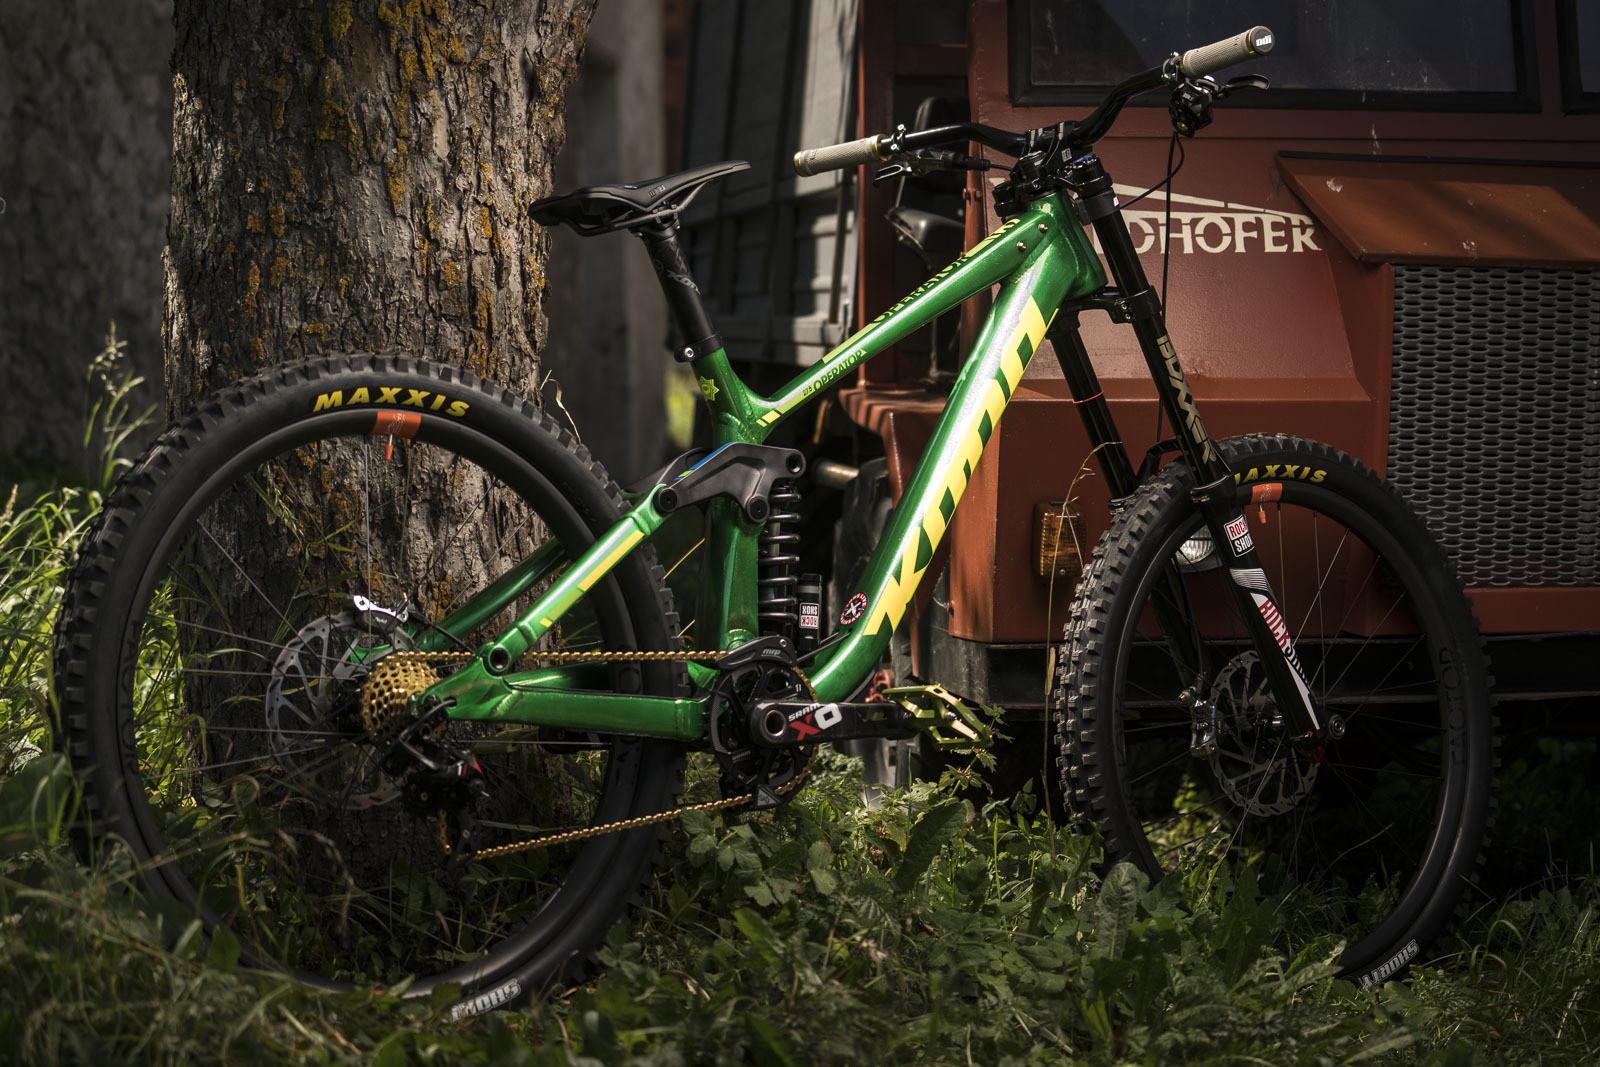 Connor Fearon's Kona Supreme Operator | 2016 World Champs Bike - PIT BITS & BIKES - 2016 World Champs - Mountain Biking Pictures - Vital MTB